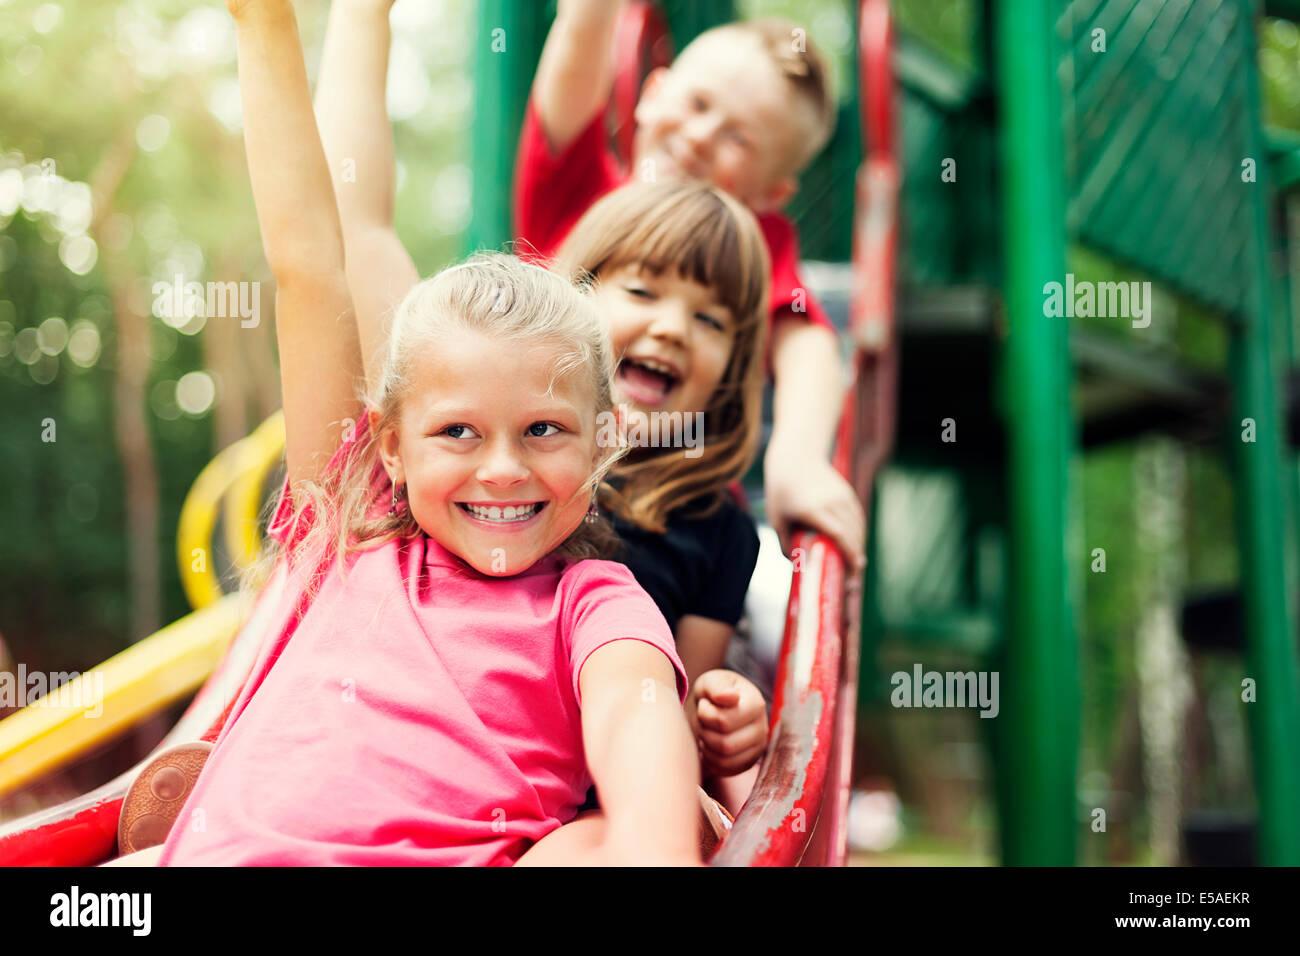 Children on slide, Debica, Poland - Stock Image